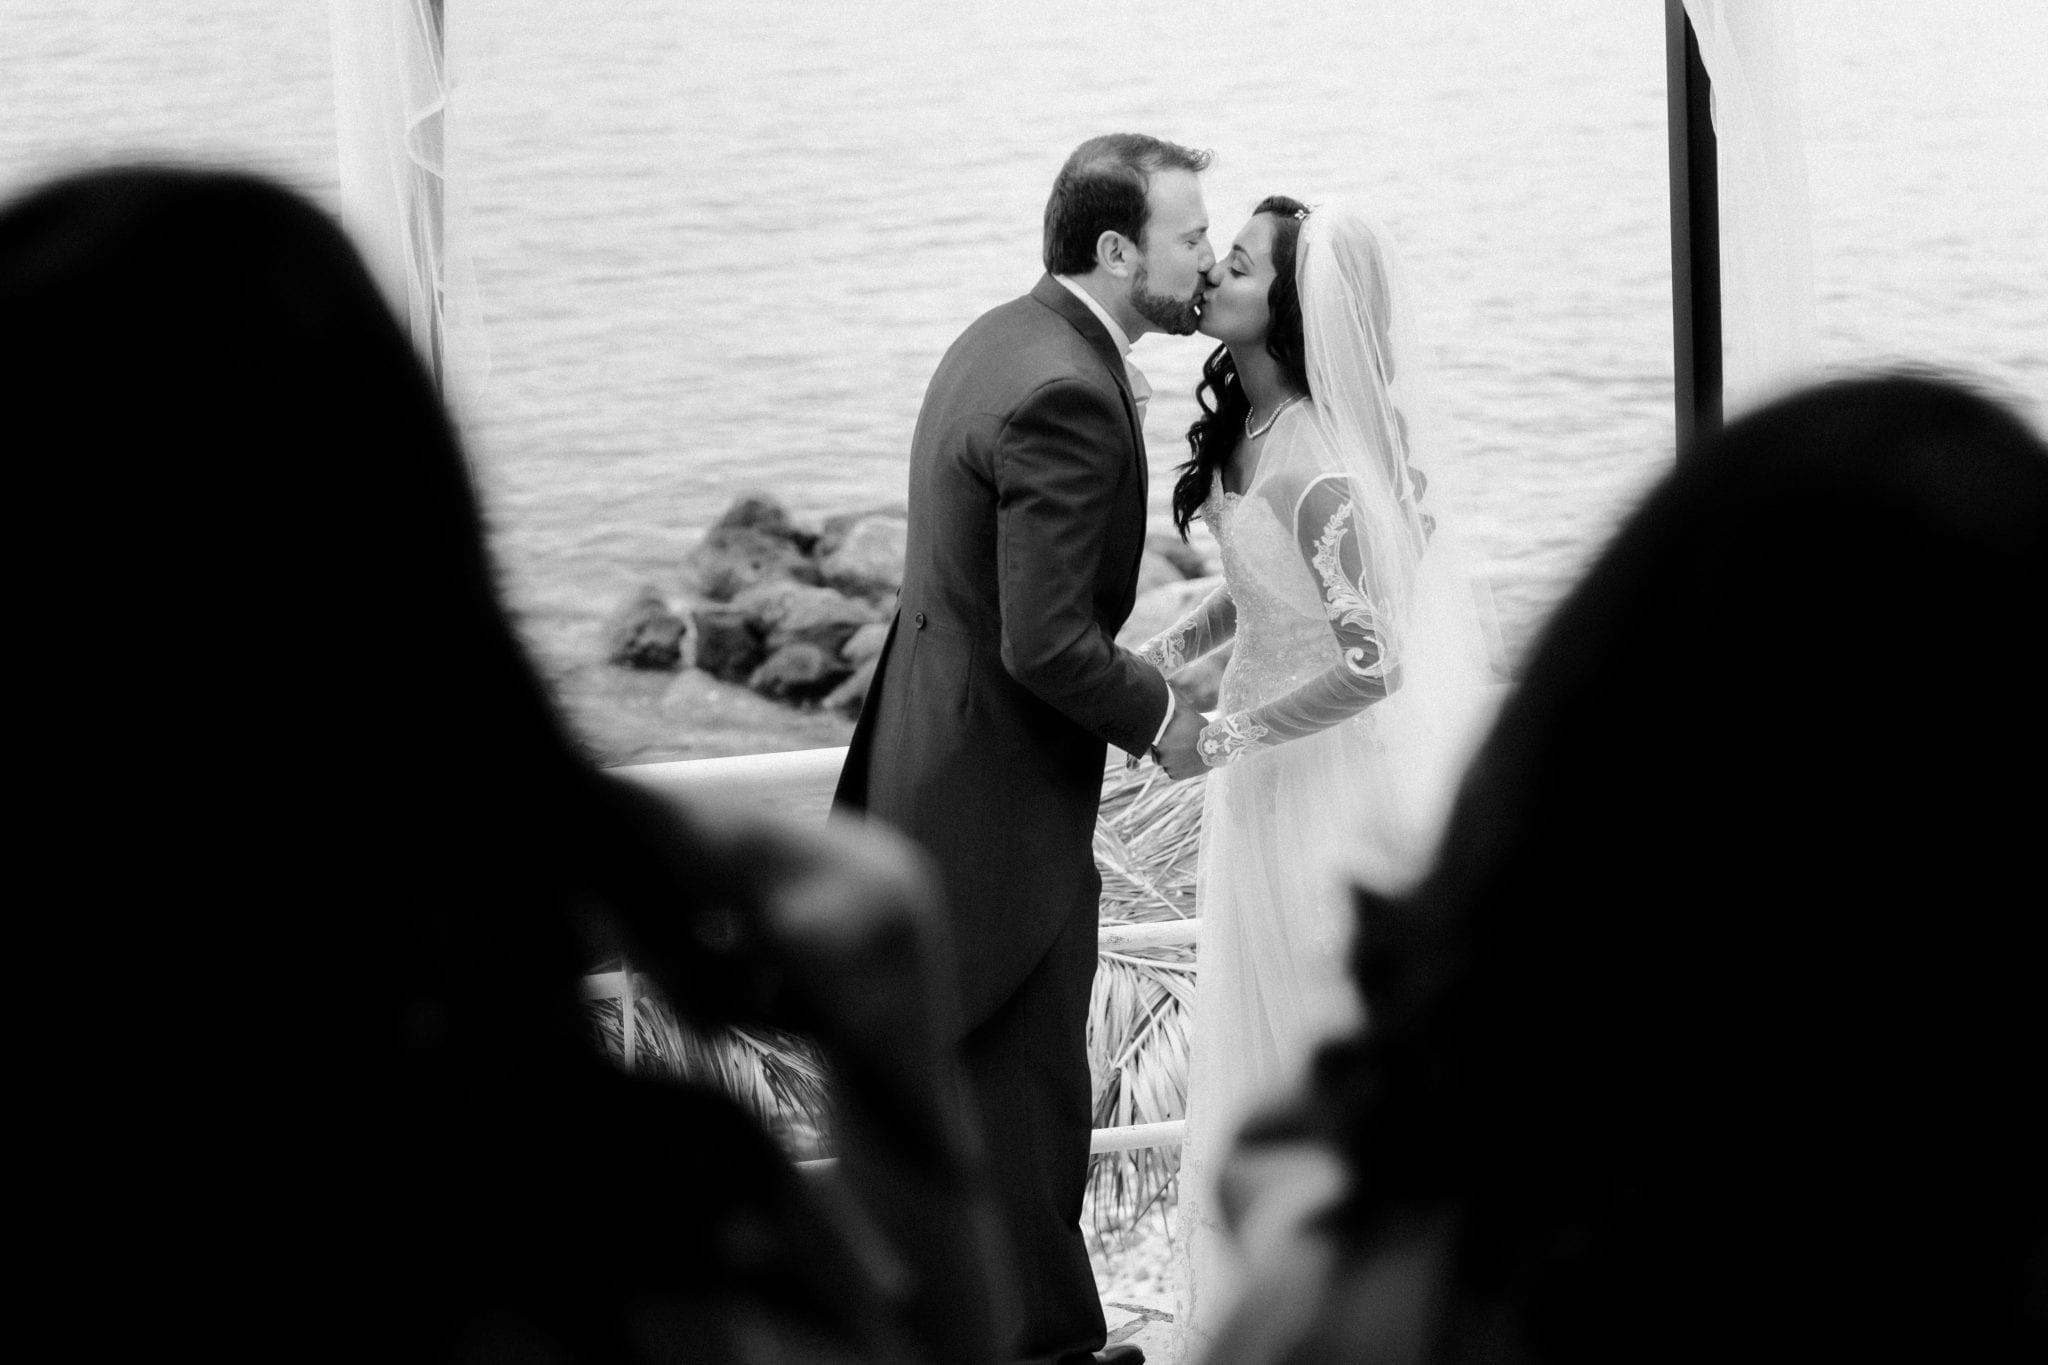 Documentary Wedding Photography - Kiss